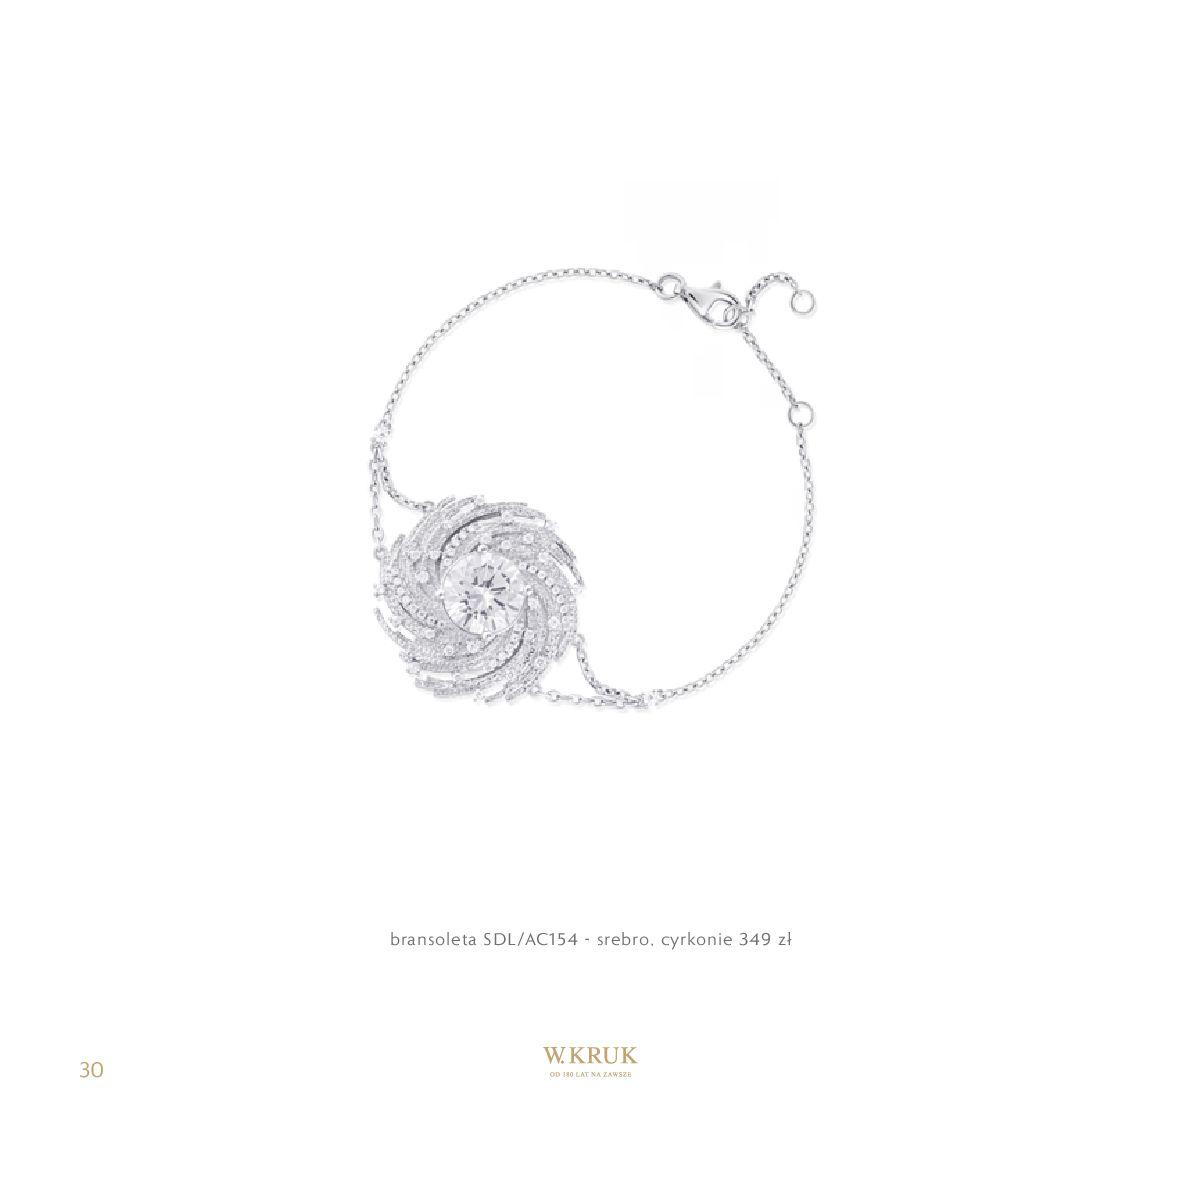 Gazetka W. KRUK: Katalog - Kolekcja Blask 2021-02-17 page-31